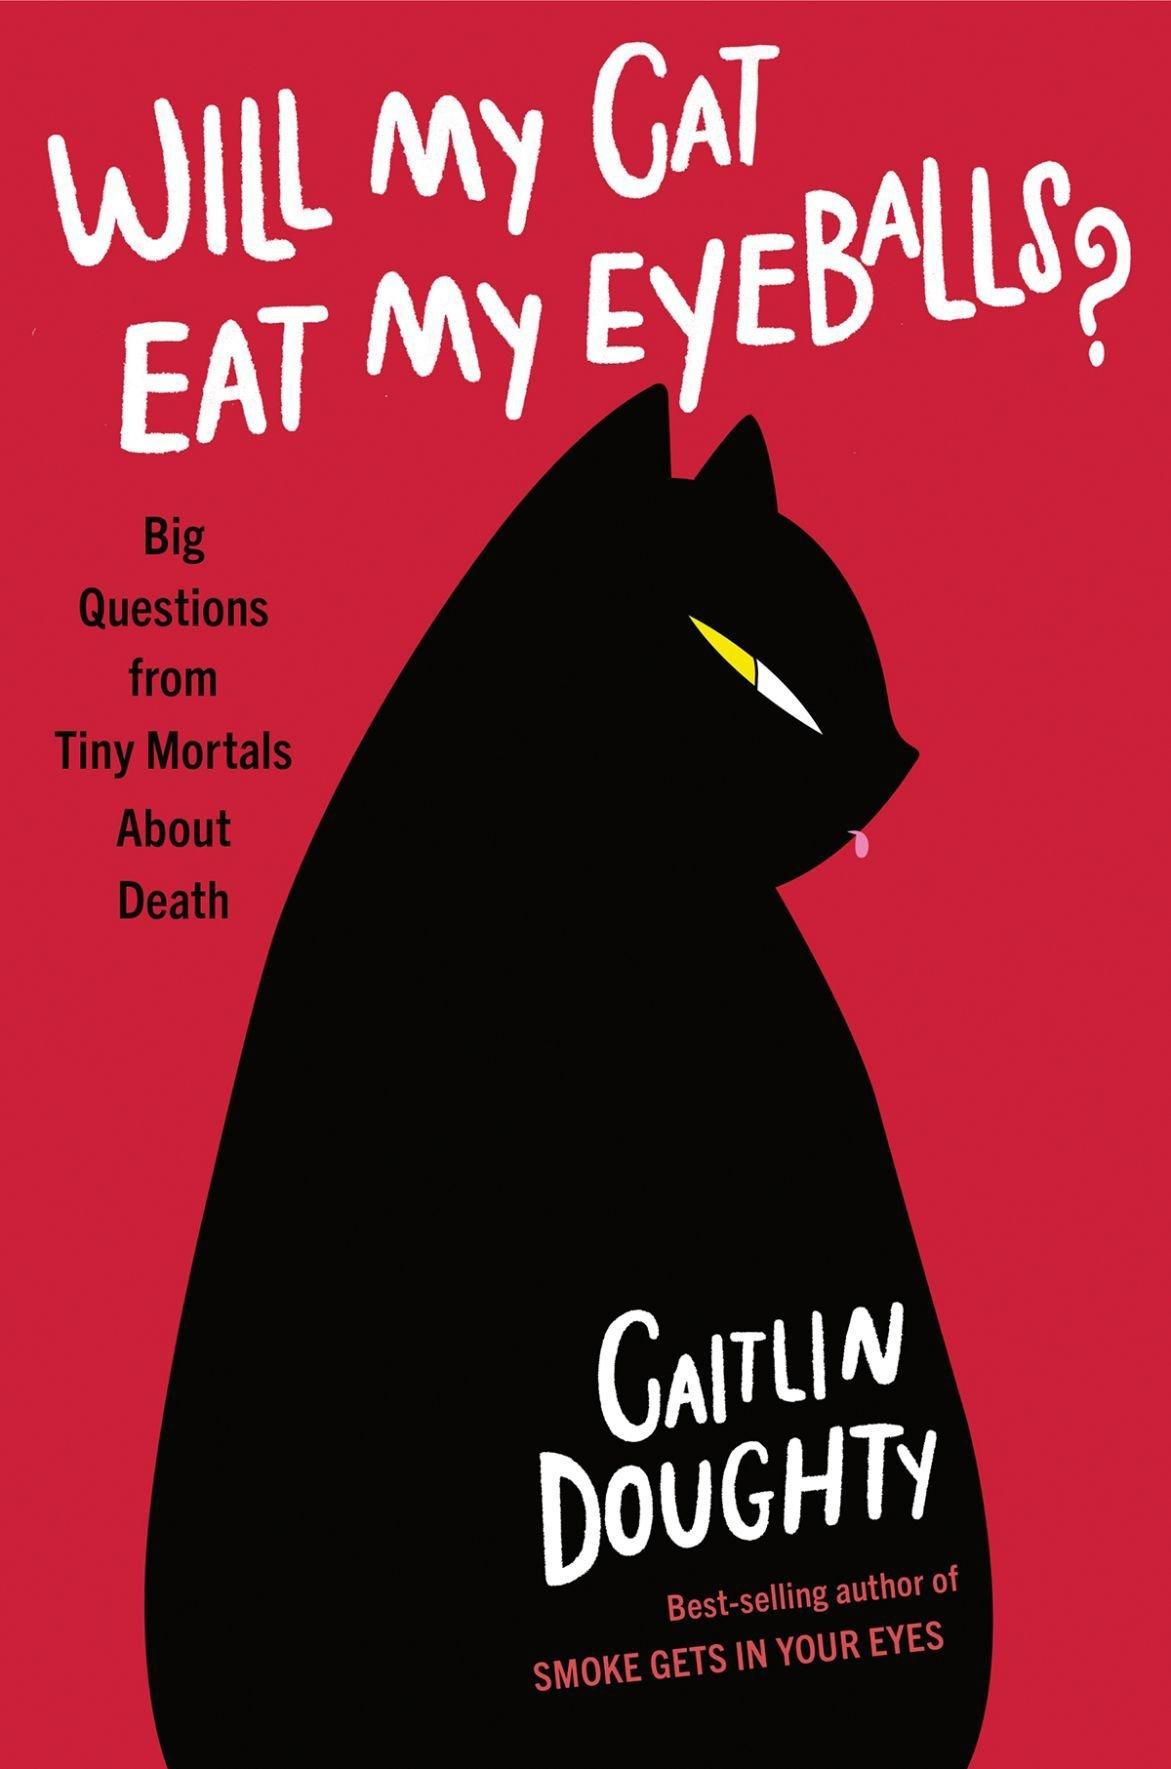 'Will My Cat Eat My Eyeballs?'